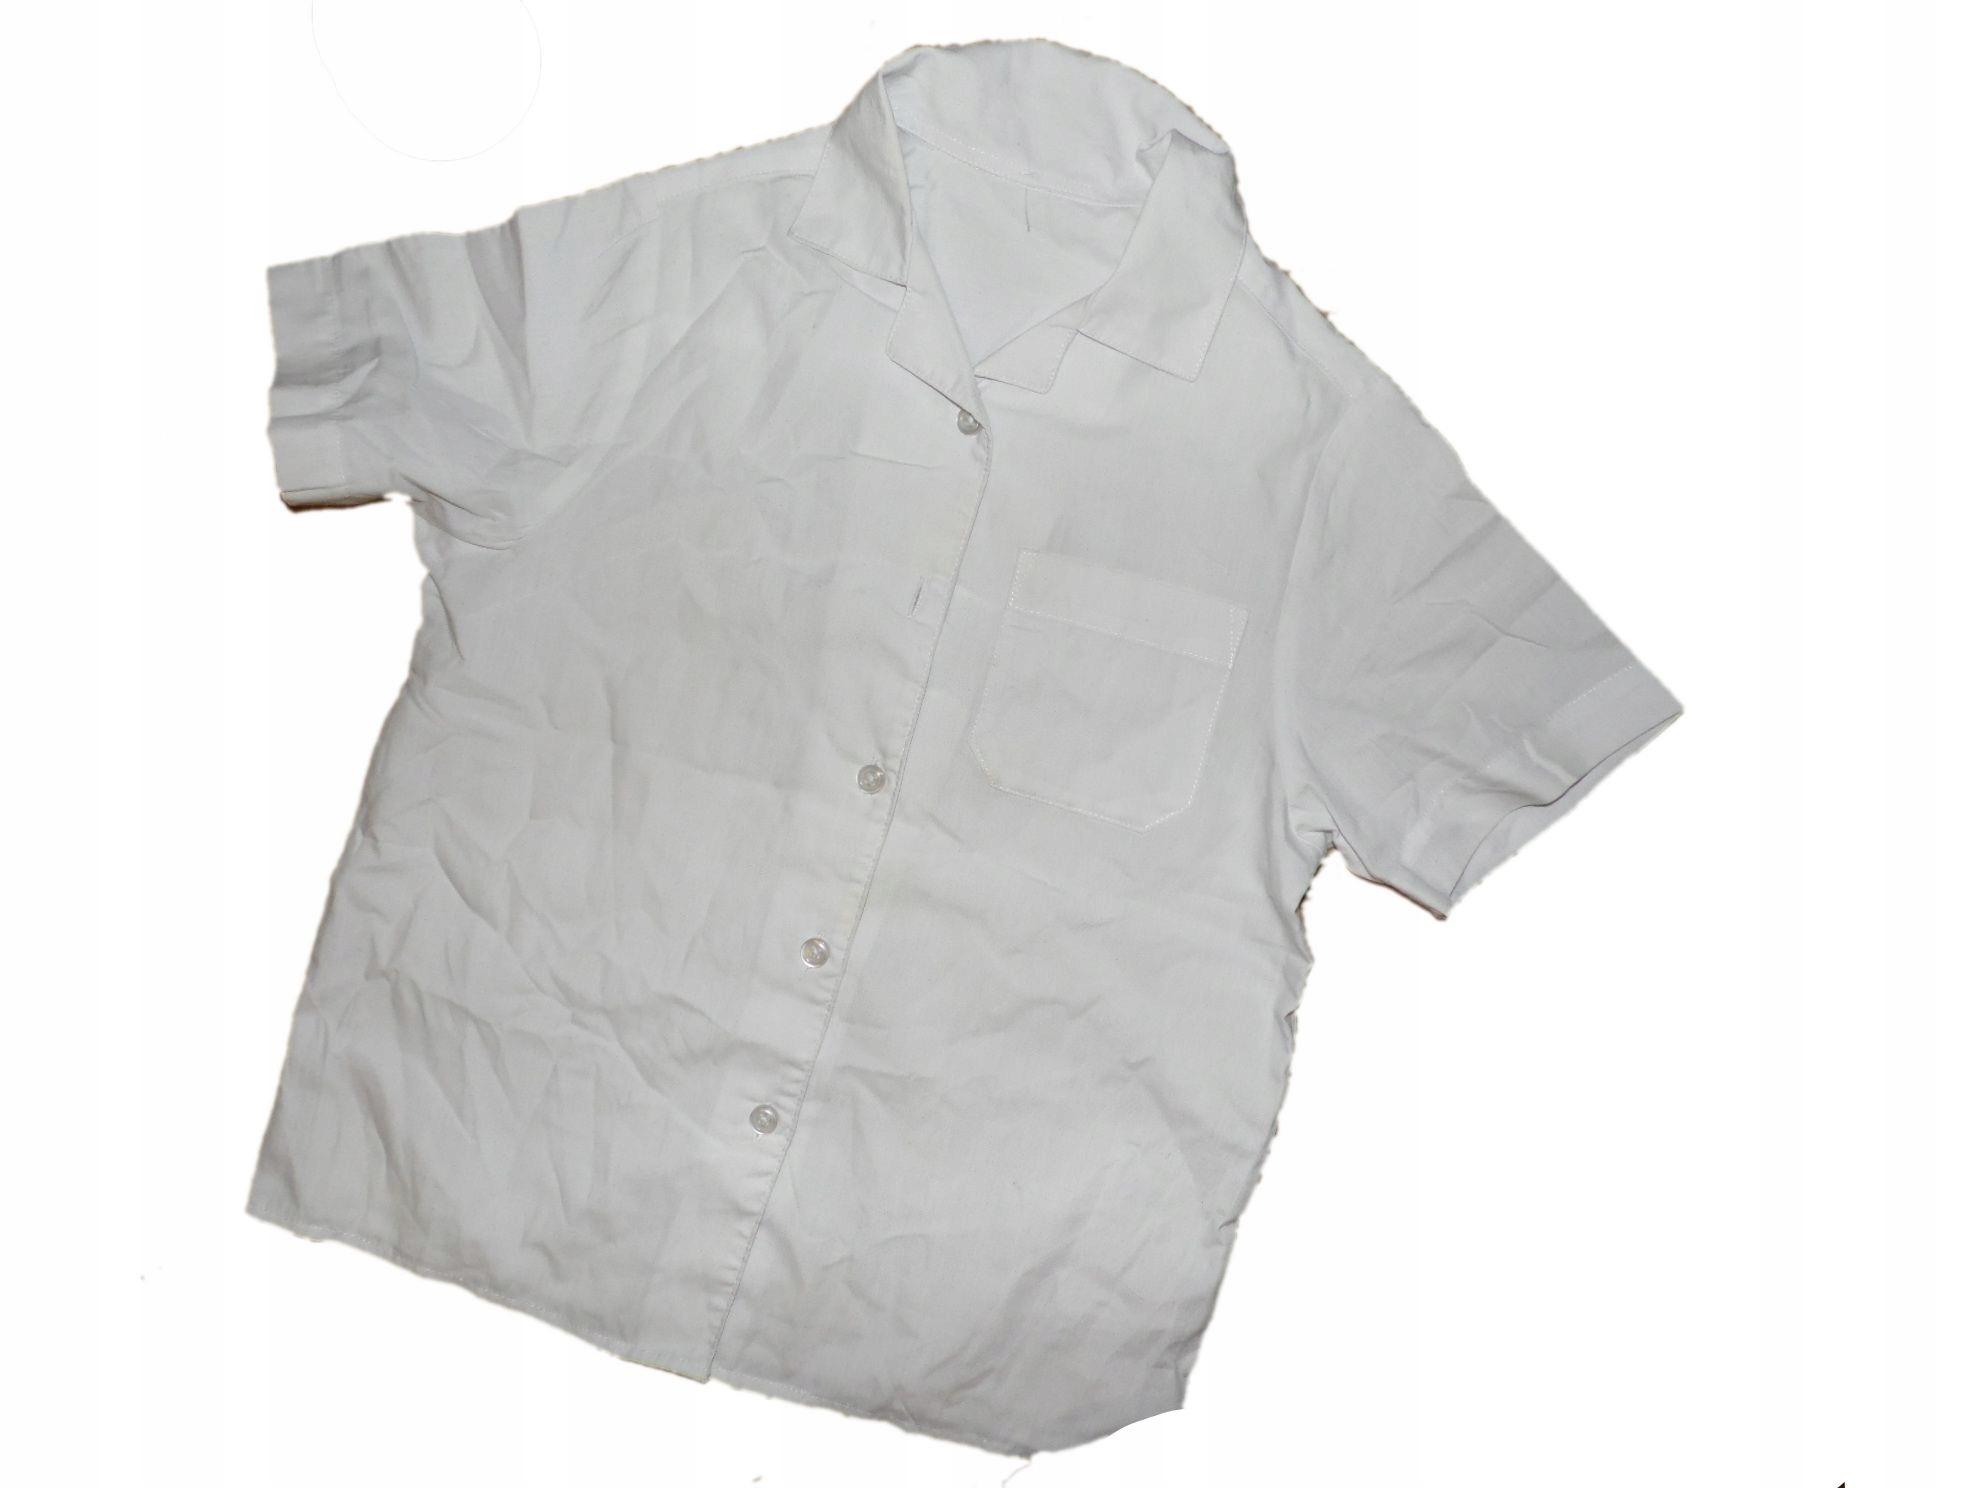 koszula biała 116 stan bdb